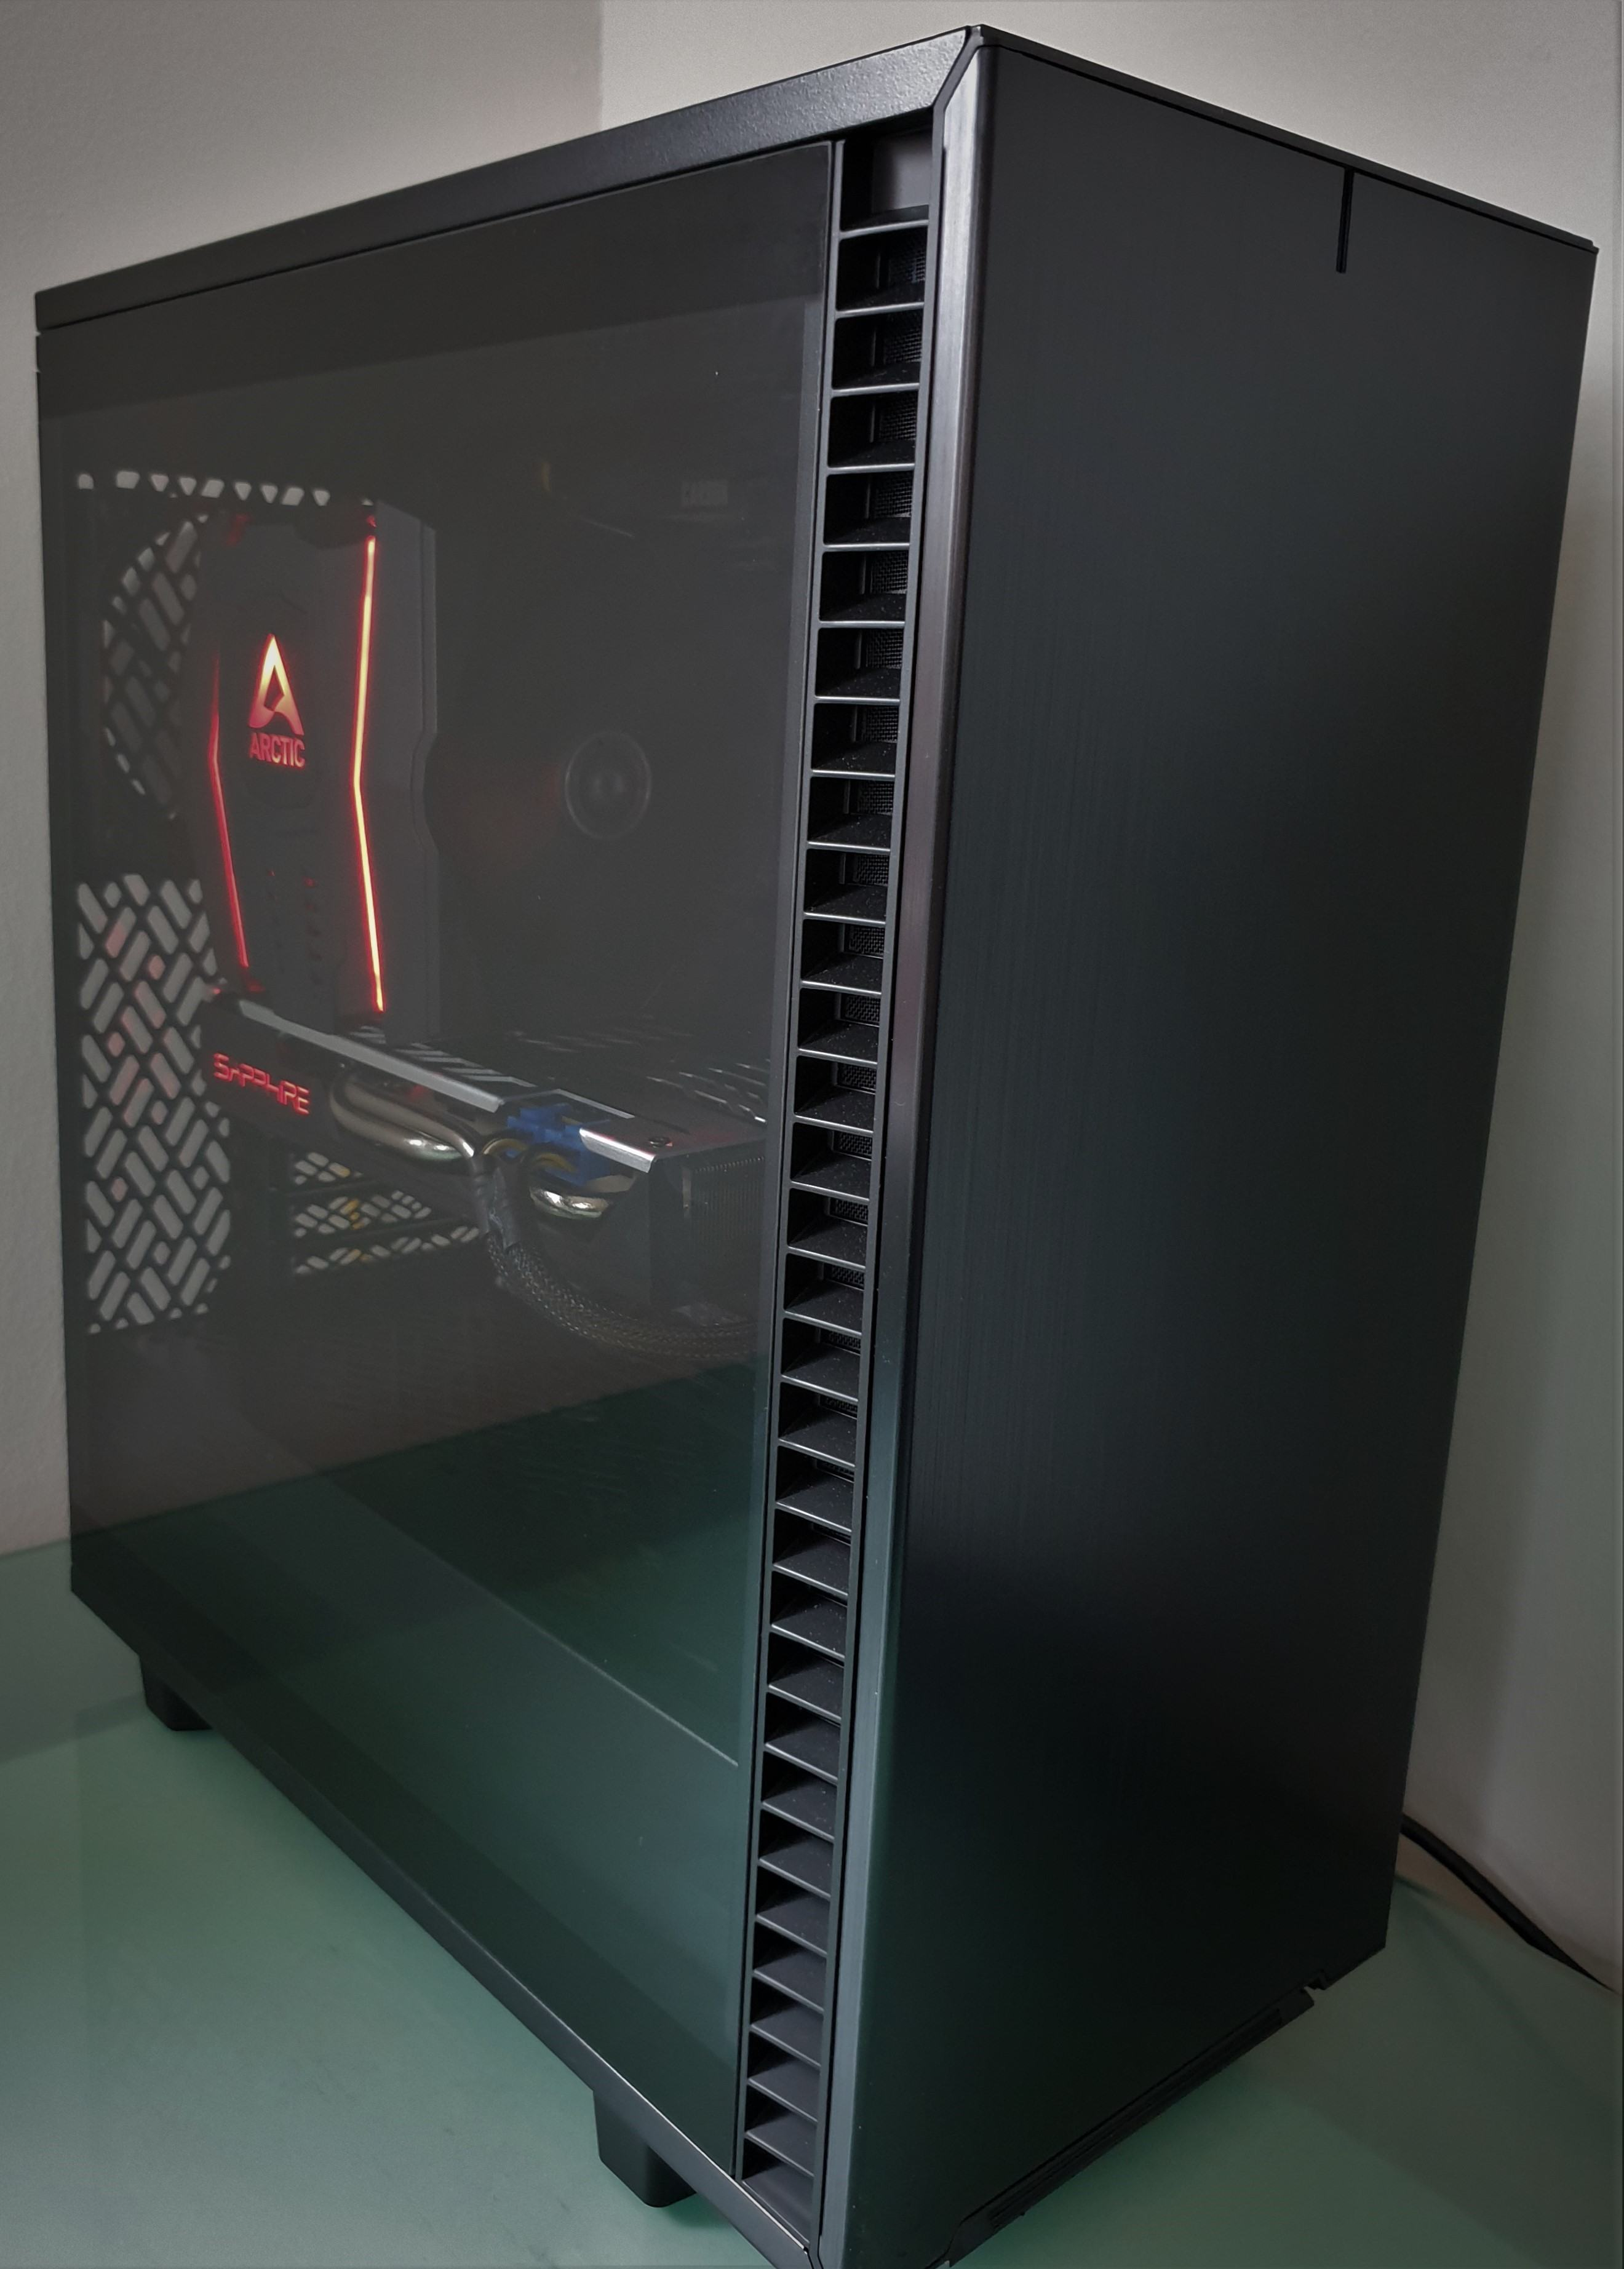 freezer 50 - window closed.jpg